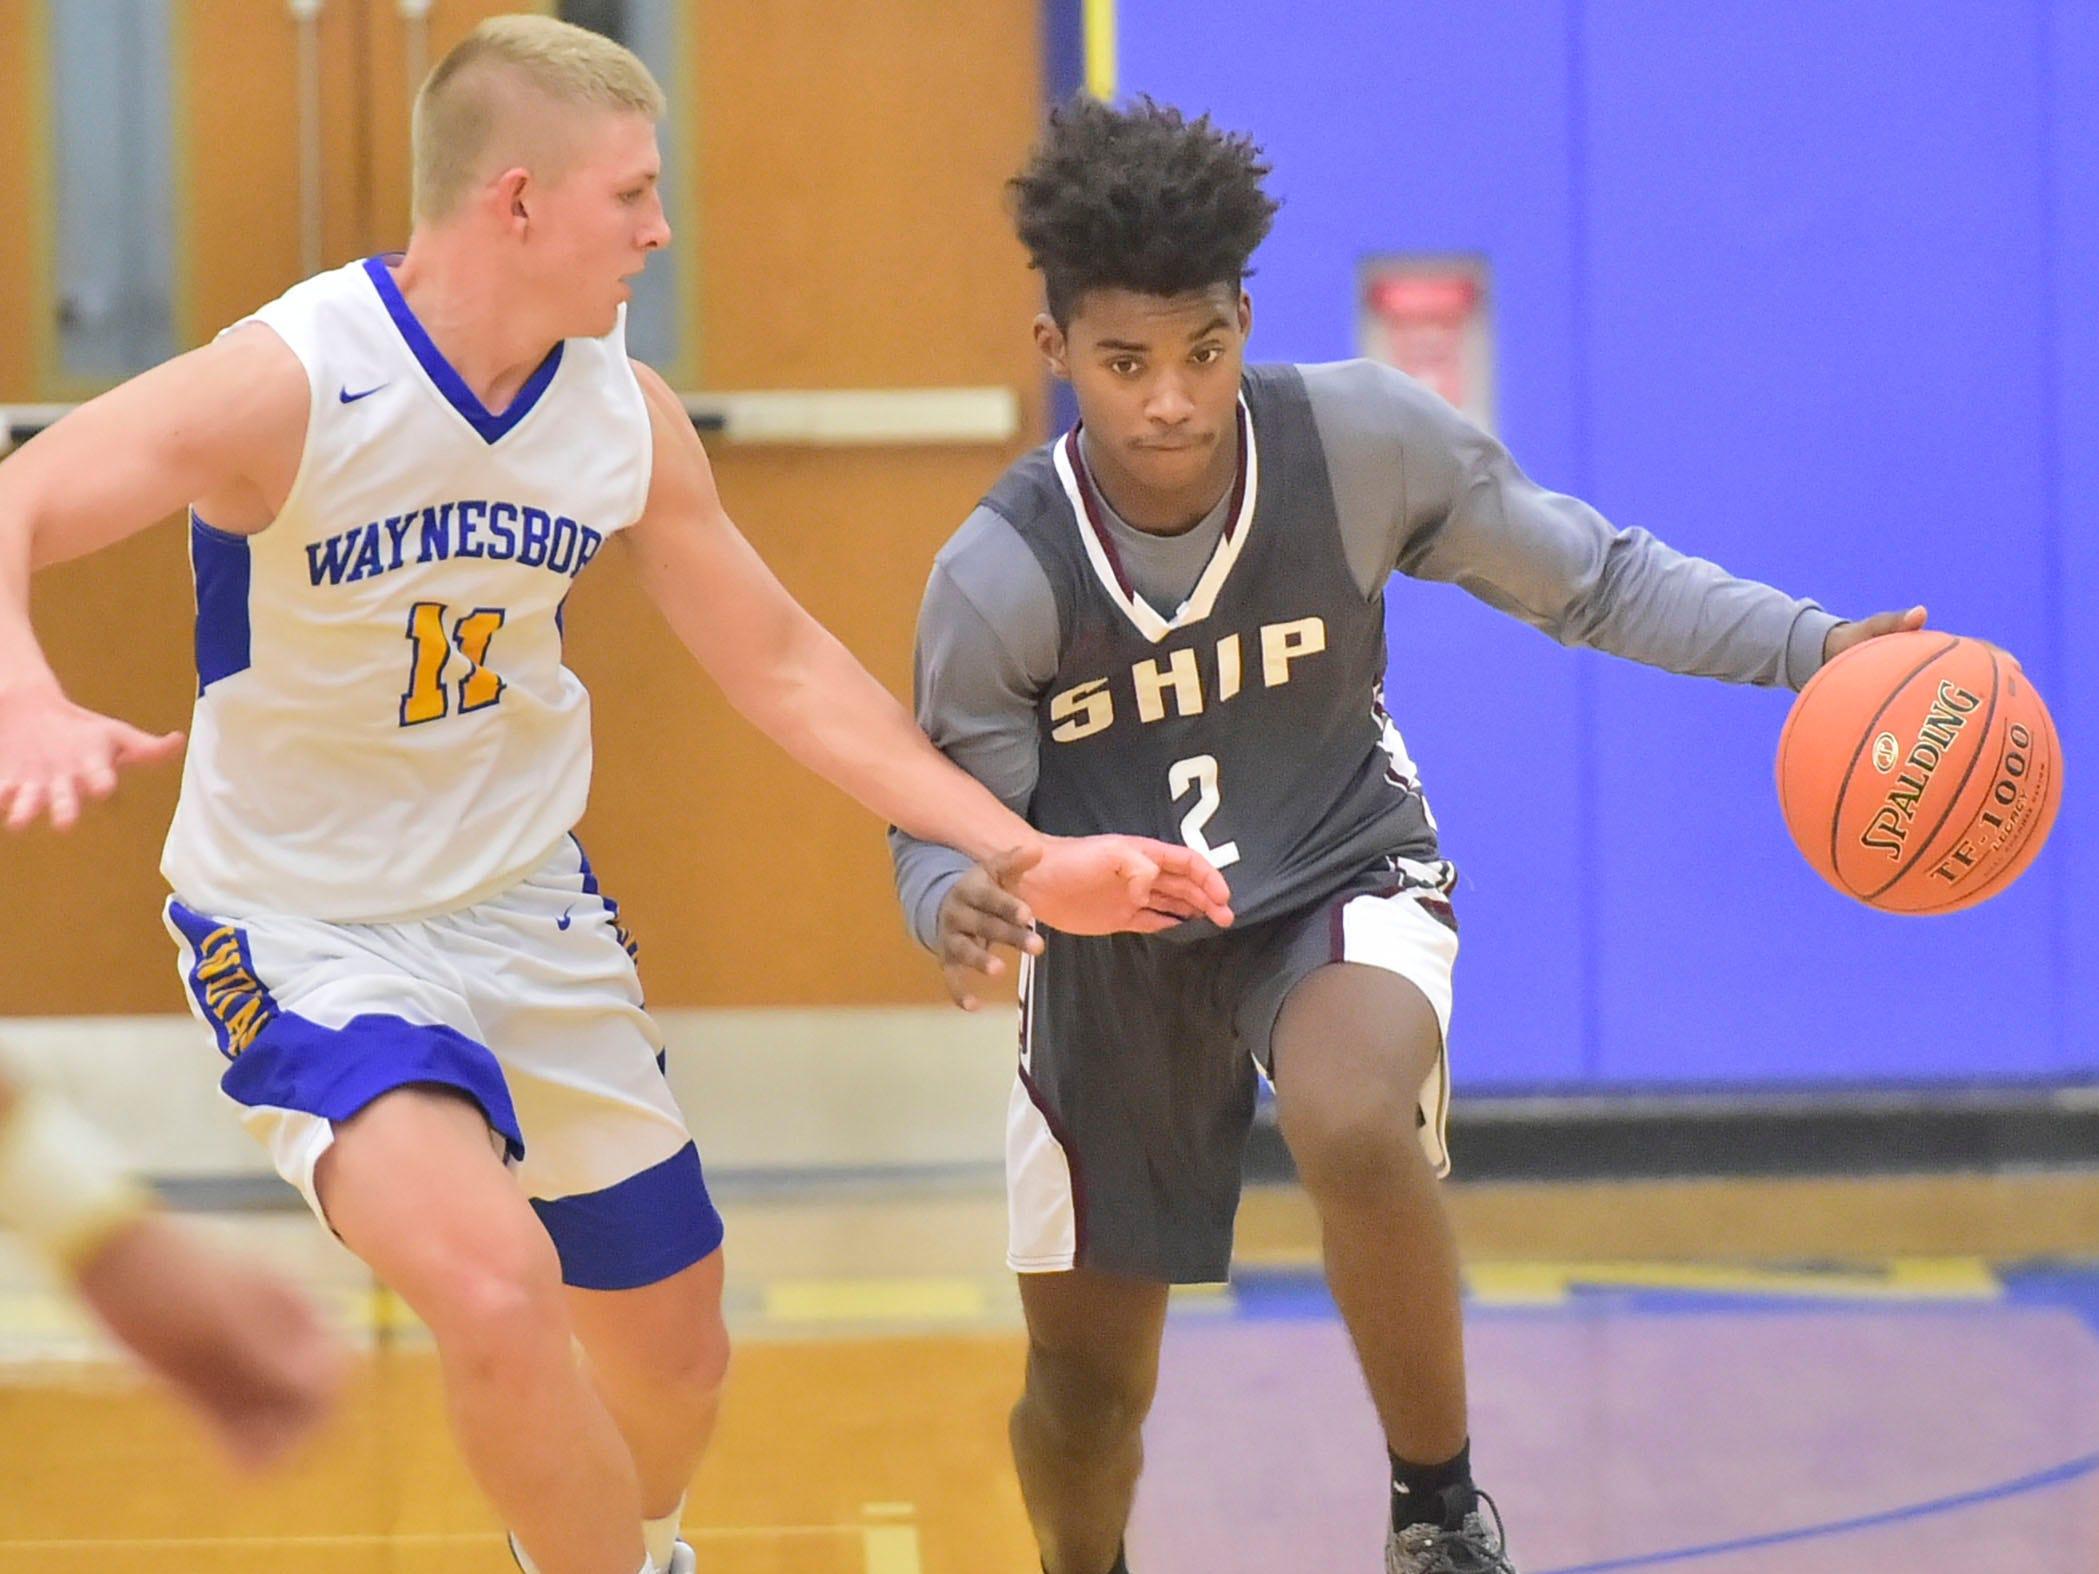 Jayden Statum of Shippensburg dribbles past (2) of Waynesboro's Derek Burhman (11) on Tuesday, December 18, 2018. Waynesboro defeated Shippensburg 72-59 during a home game.